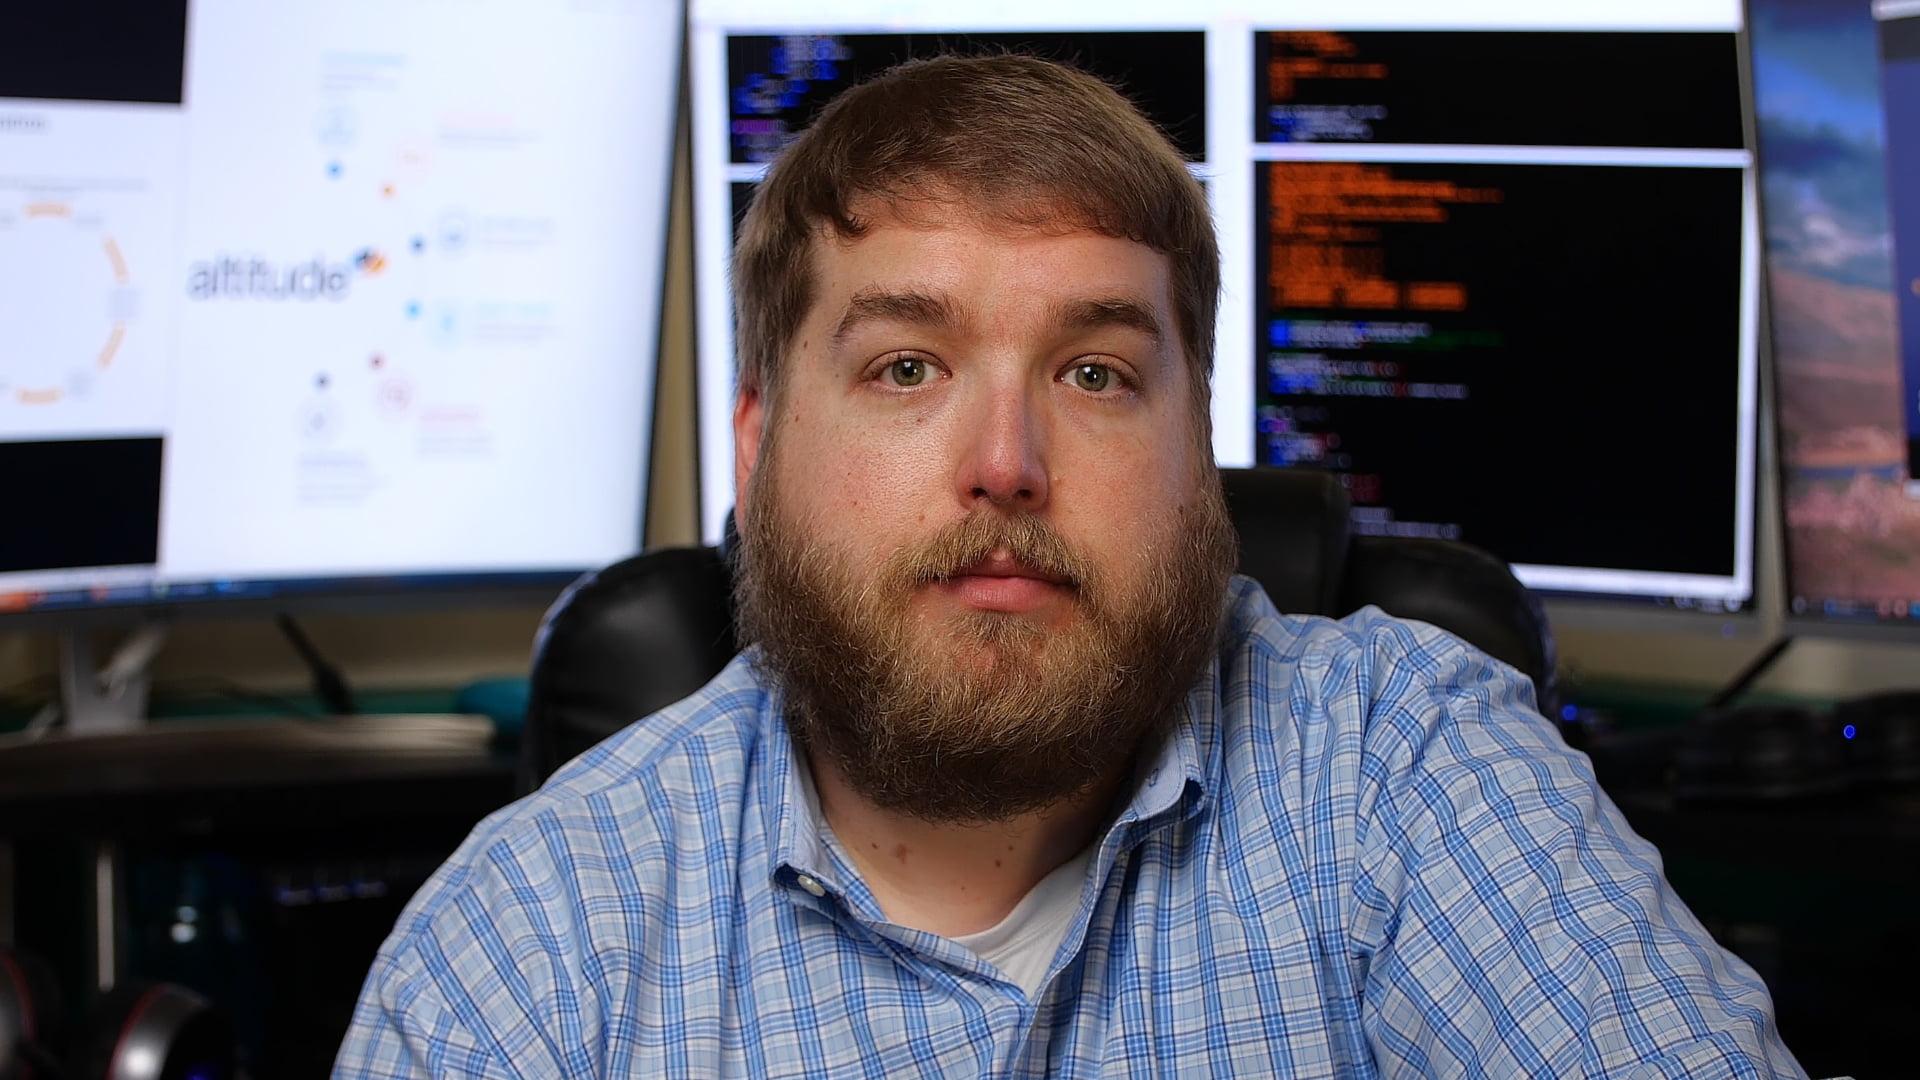 Adam Gruber